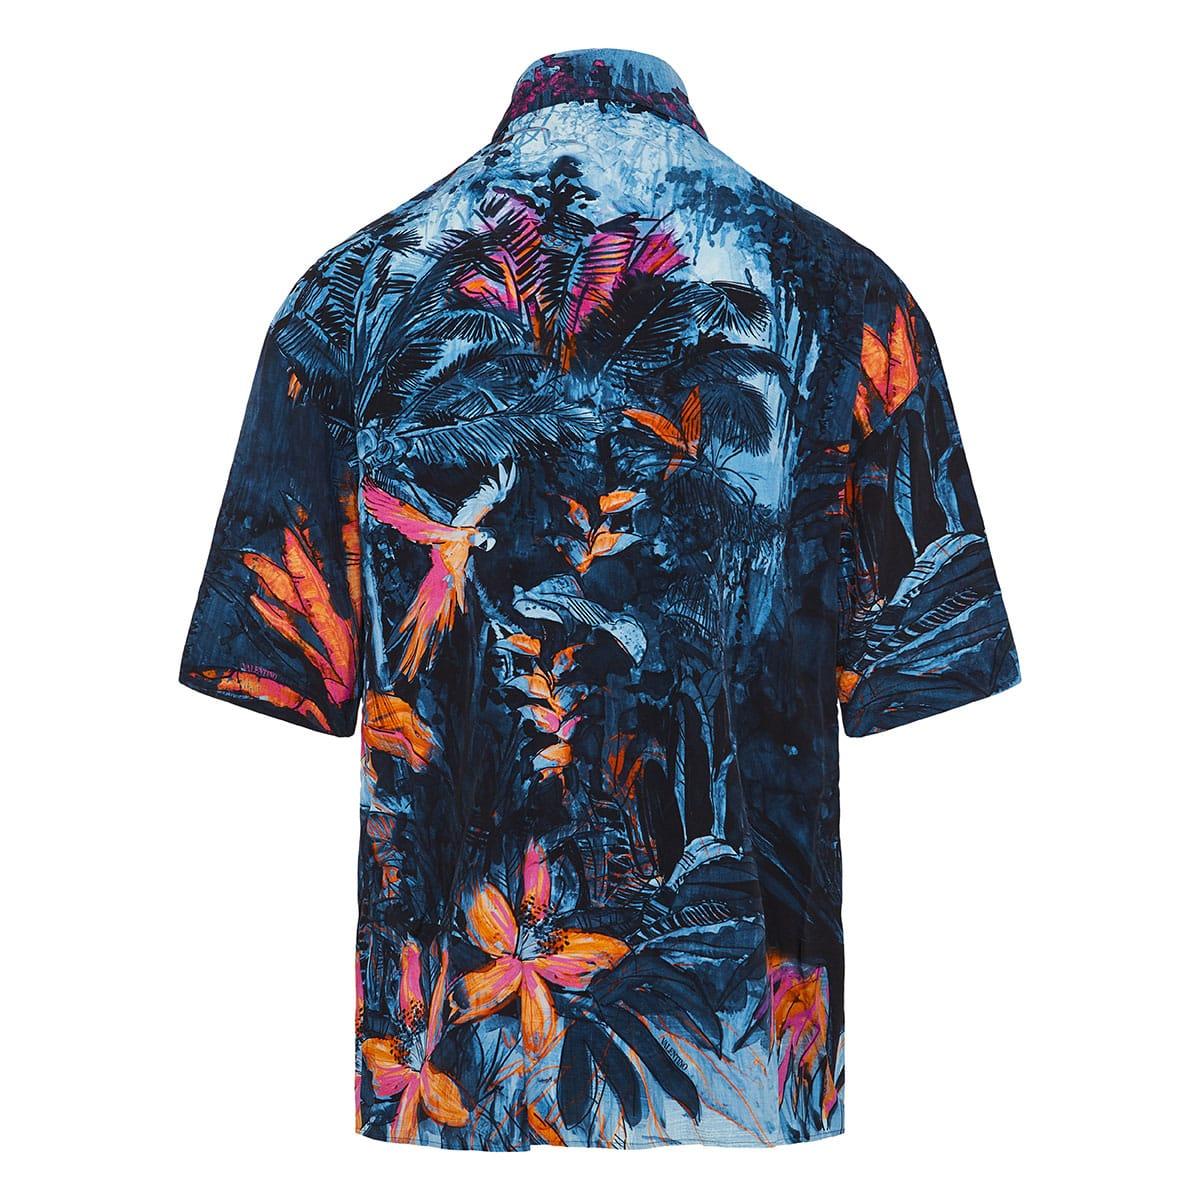 Oversized Mural Jungle shirt